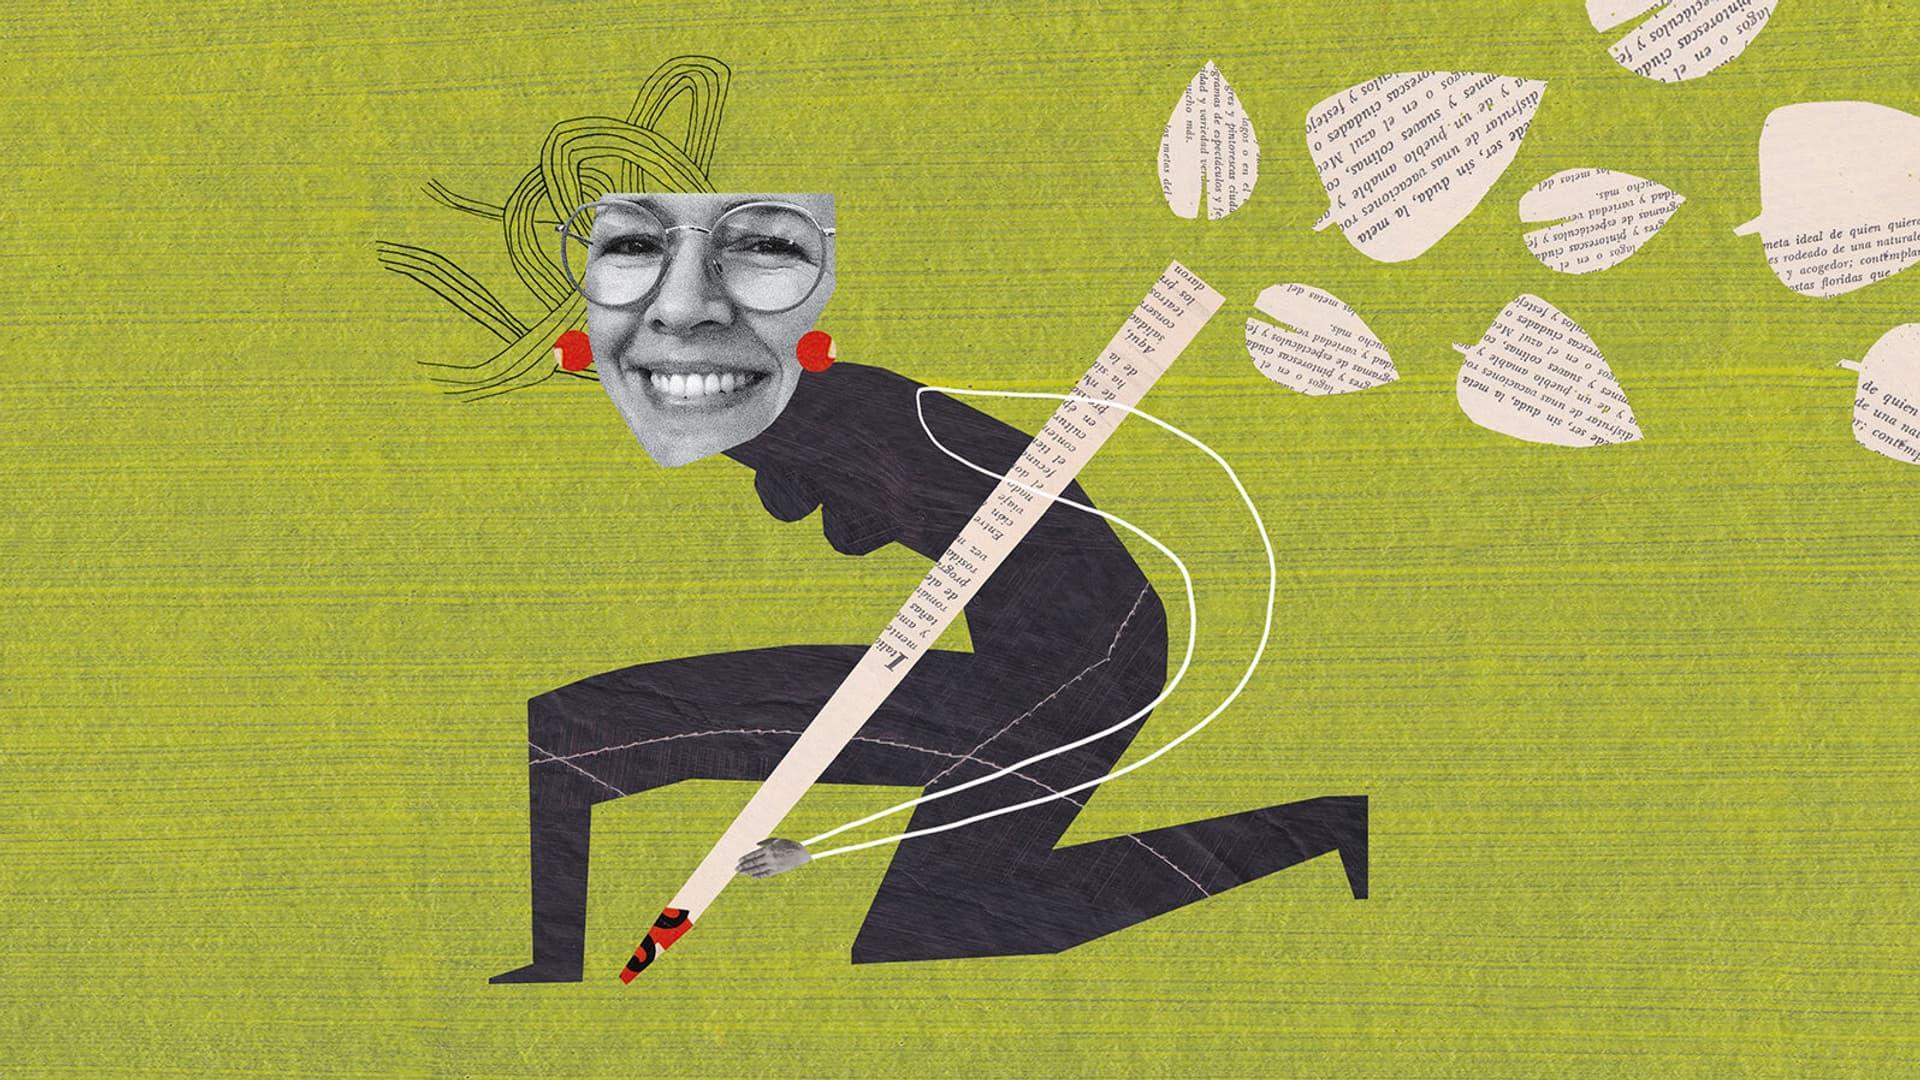 Jutta Koch hält einen Stift aus Zeitungspapier, aus dem Blätter fliegen